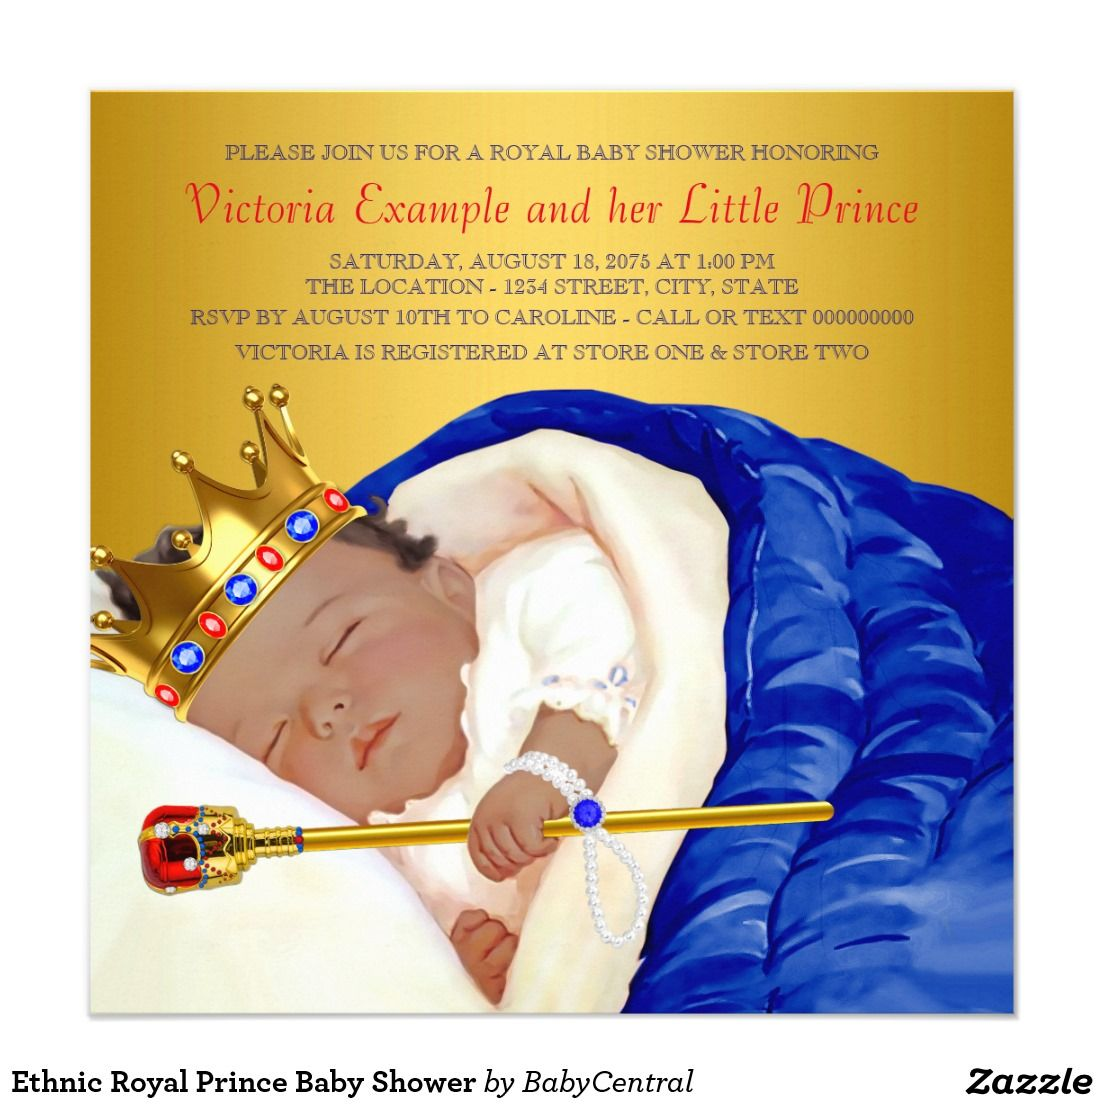 Ethnic Royal Prince Baby Shower Invitation | Prince Baby Shower ...